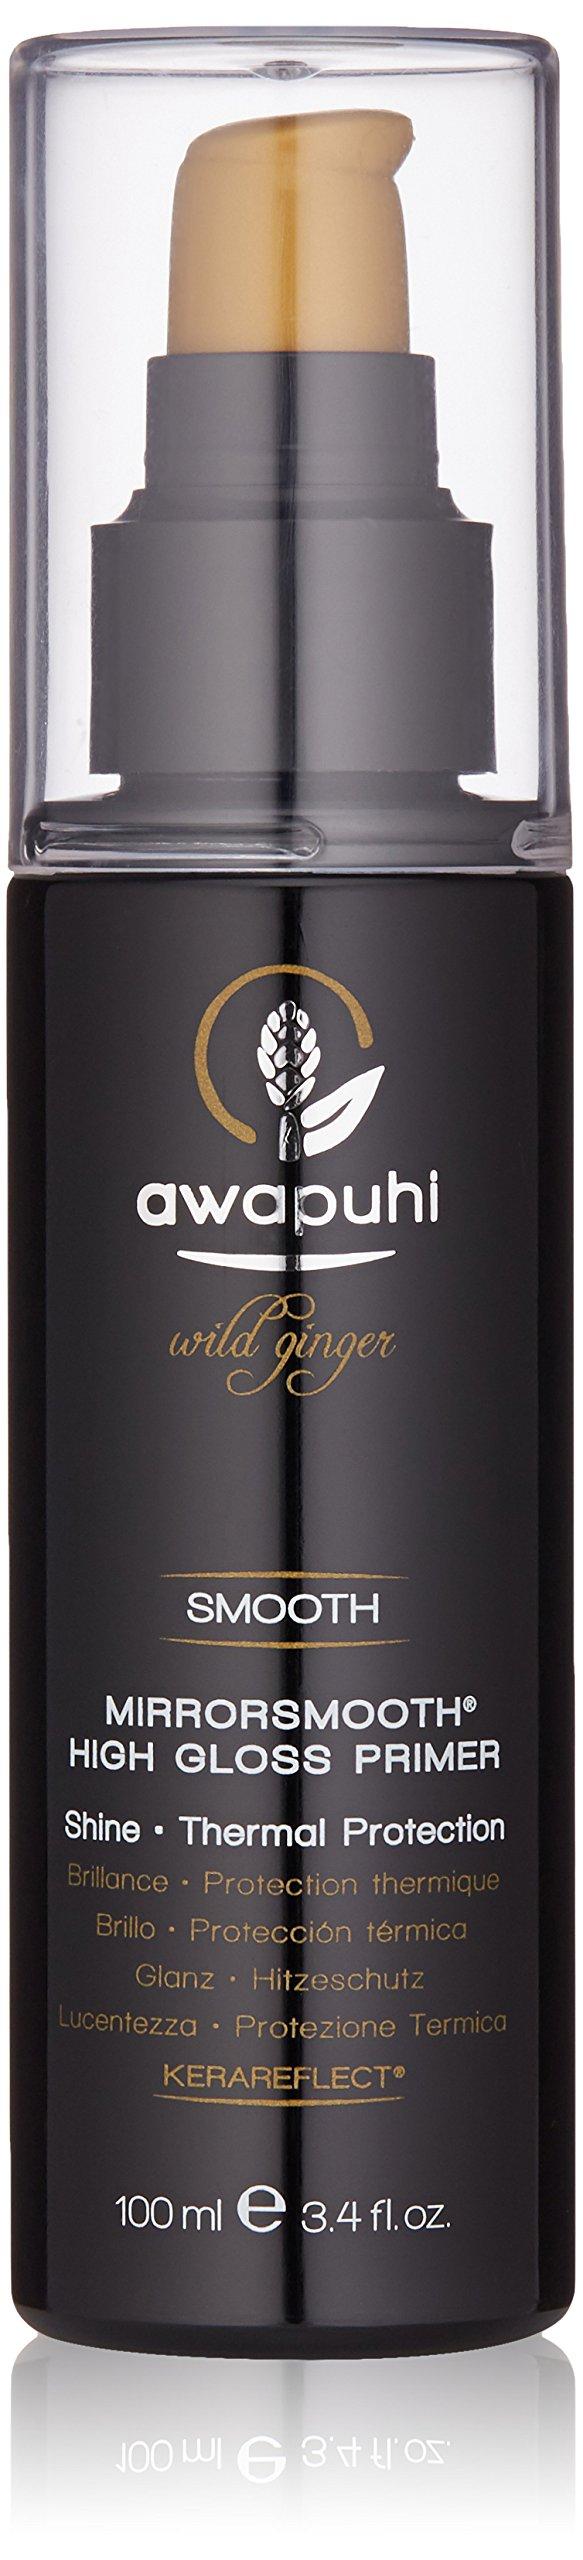 Awapuhi Wild Ginger MirrorSmooth High Gloss Primer